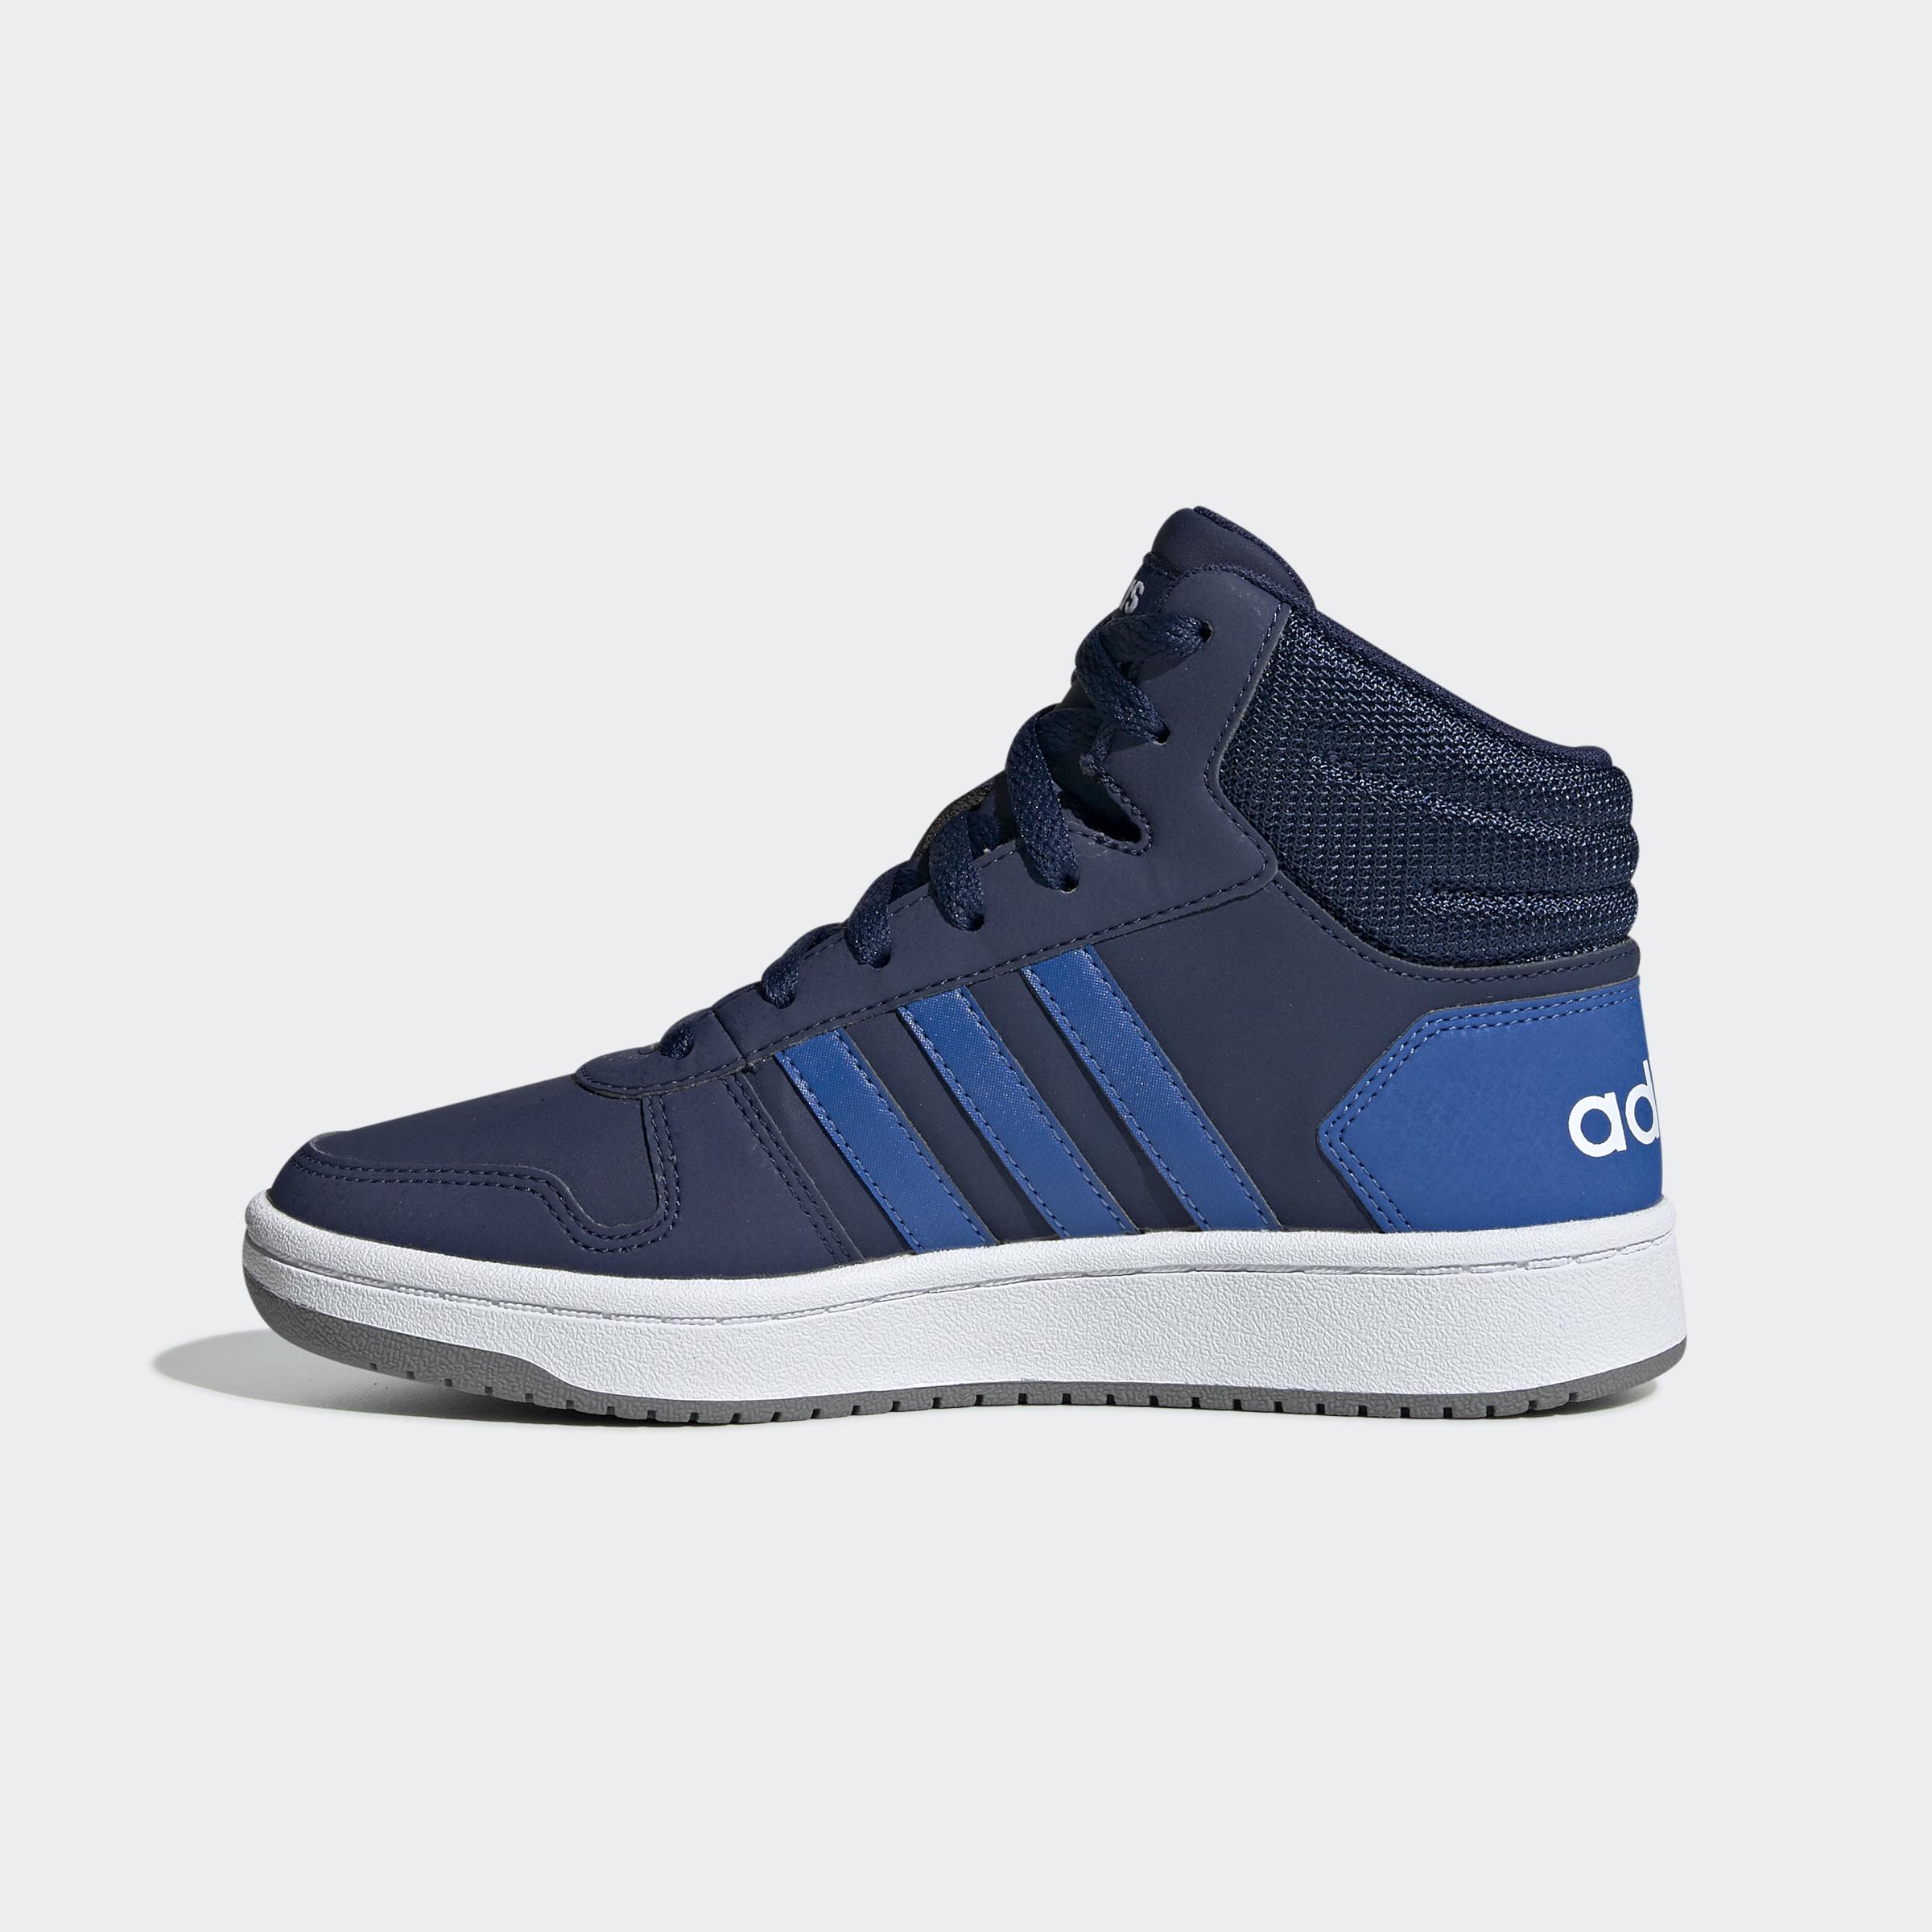 adidas-Hoops-2-0-Mid-Shoes-Kids-039-High-Tops thumbnail 14